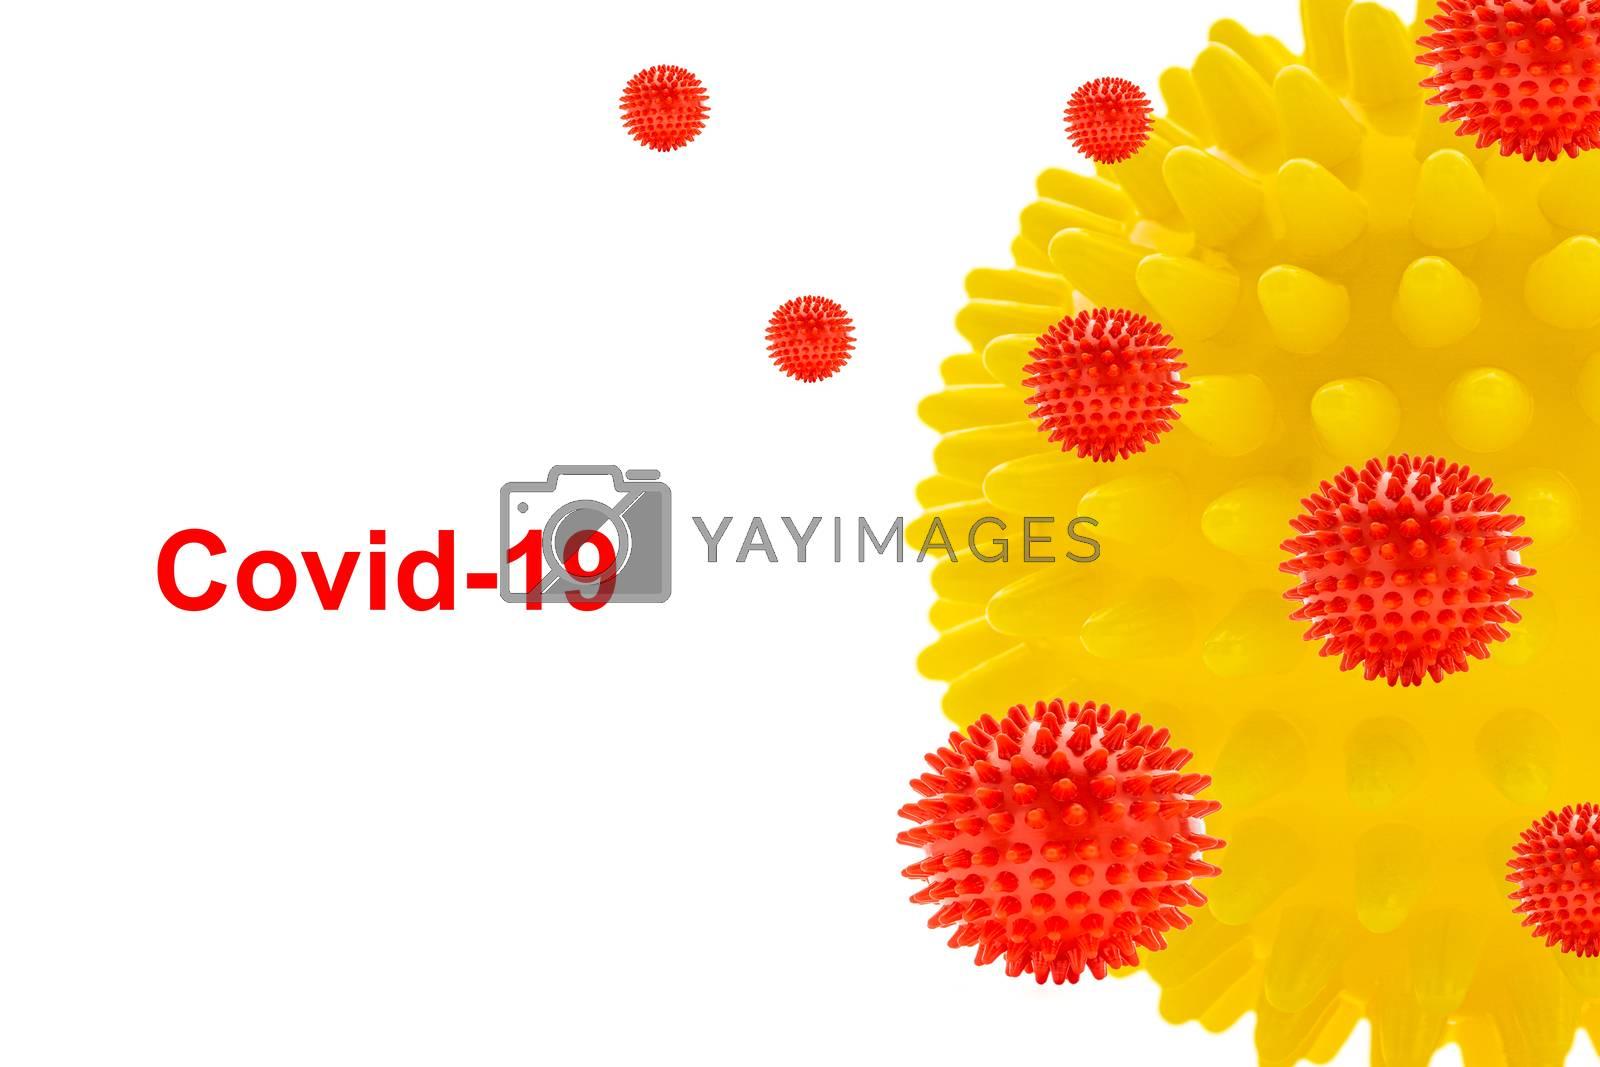 COVID-19 text on white background. Covid-19 or Coronavirus